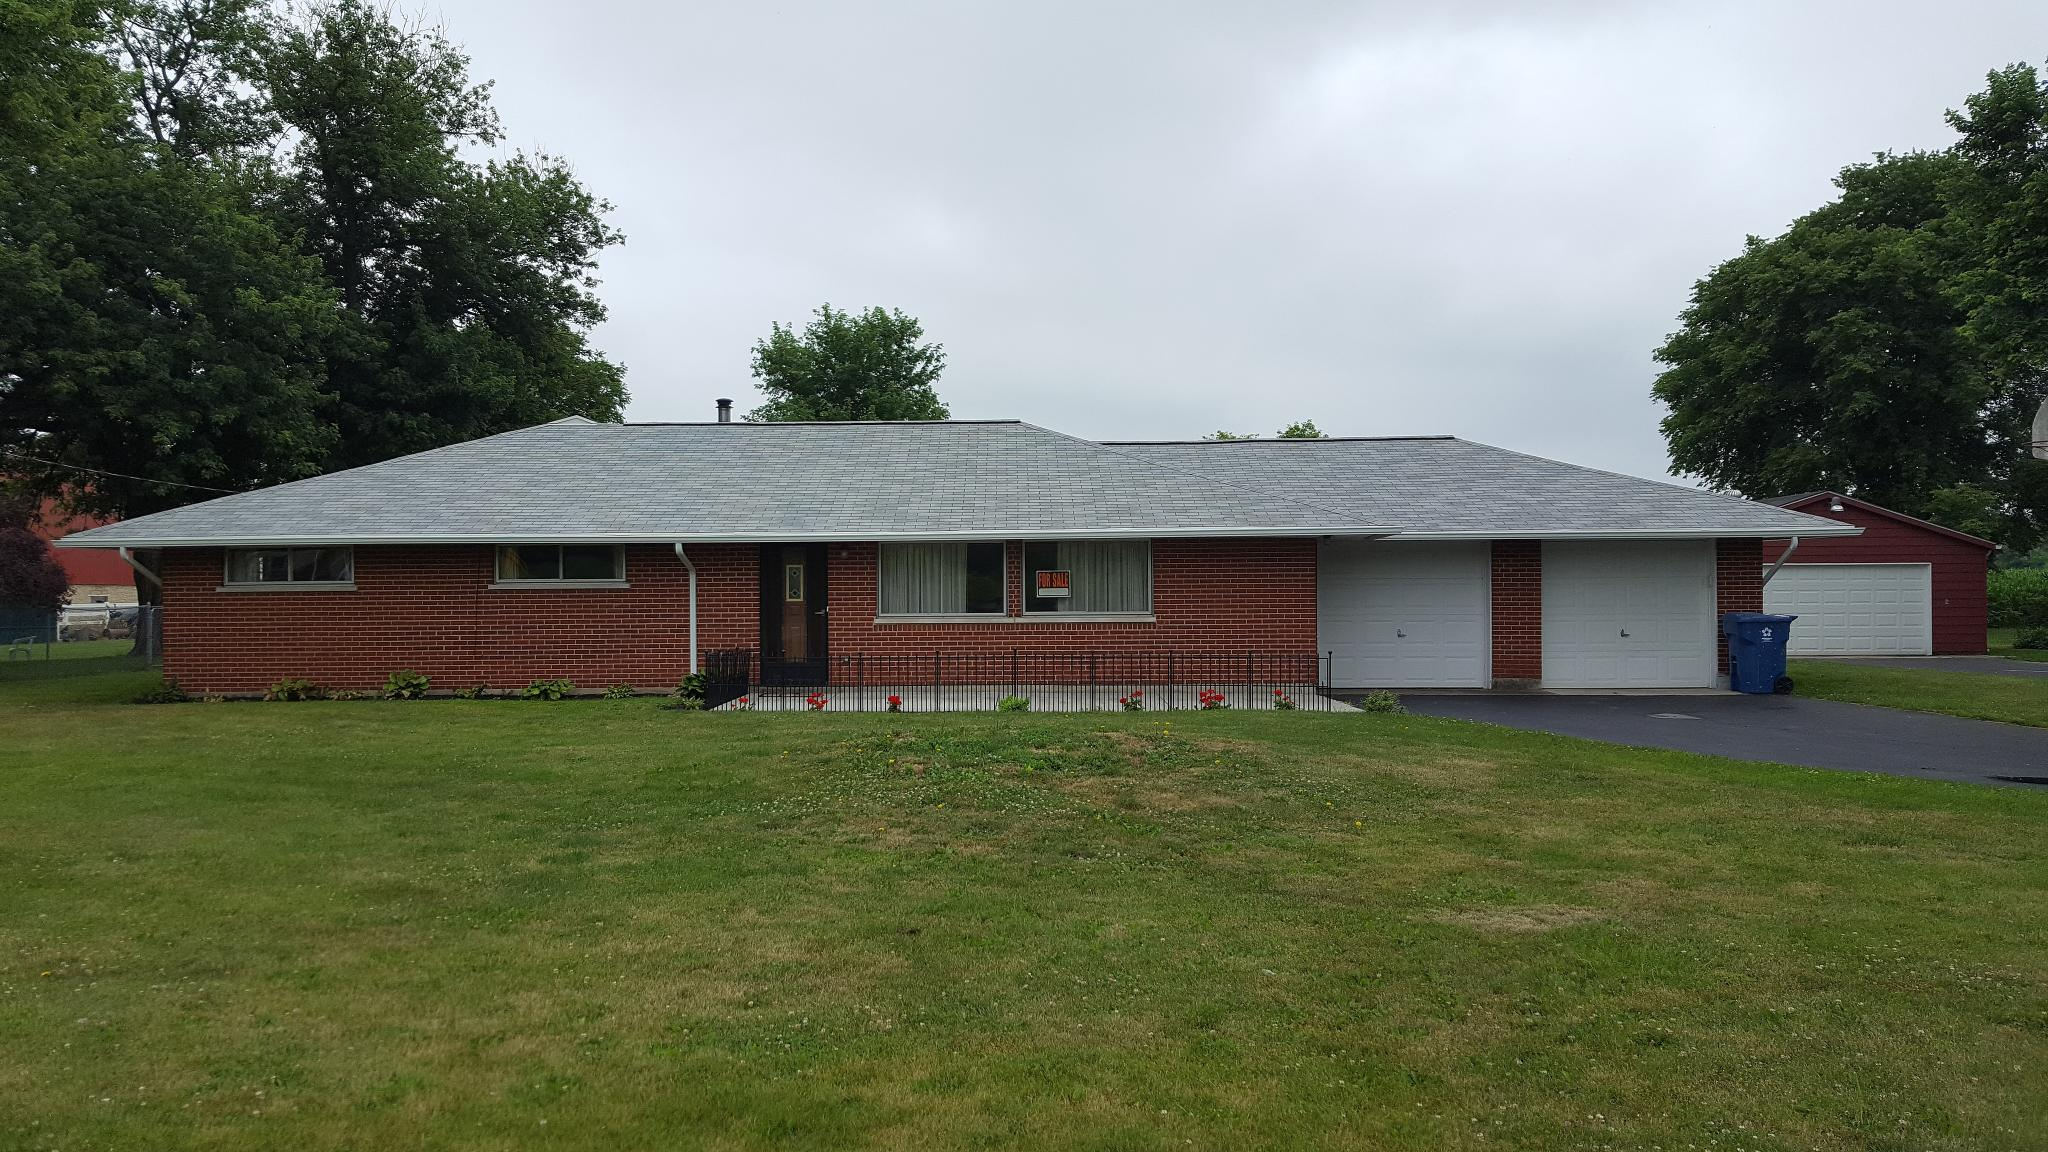 Ohio clark county new carlisle - 9351 Lower Valley Pike